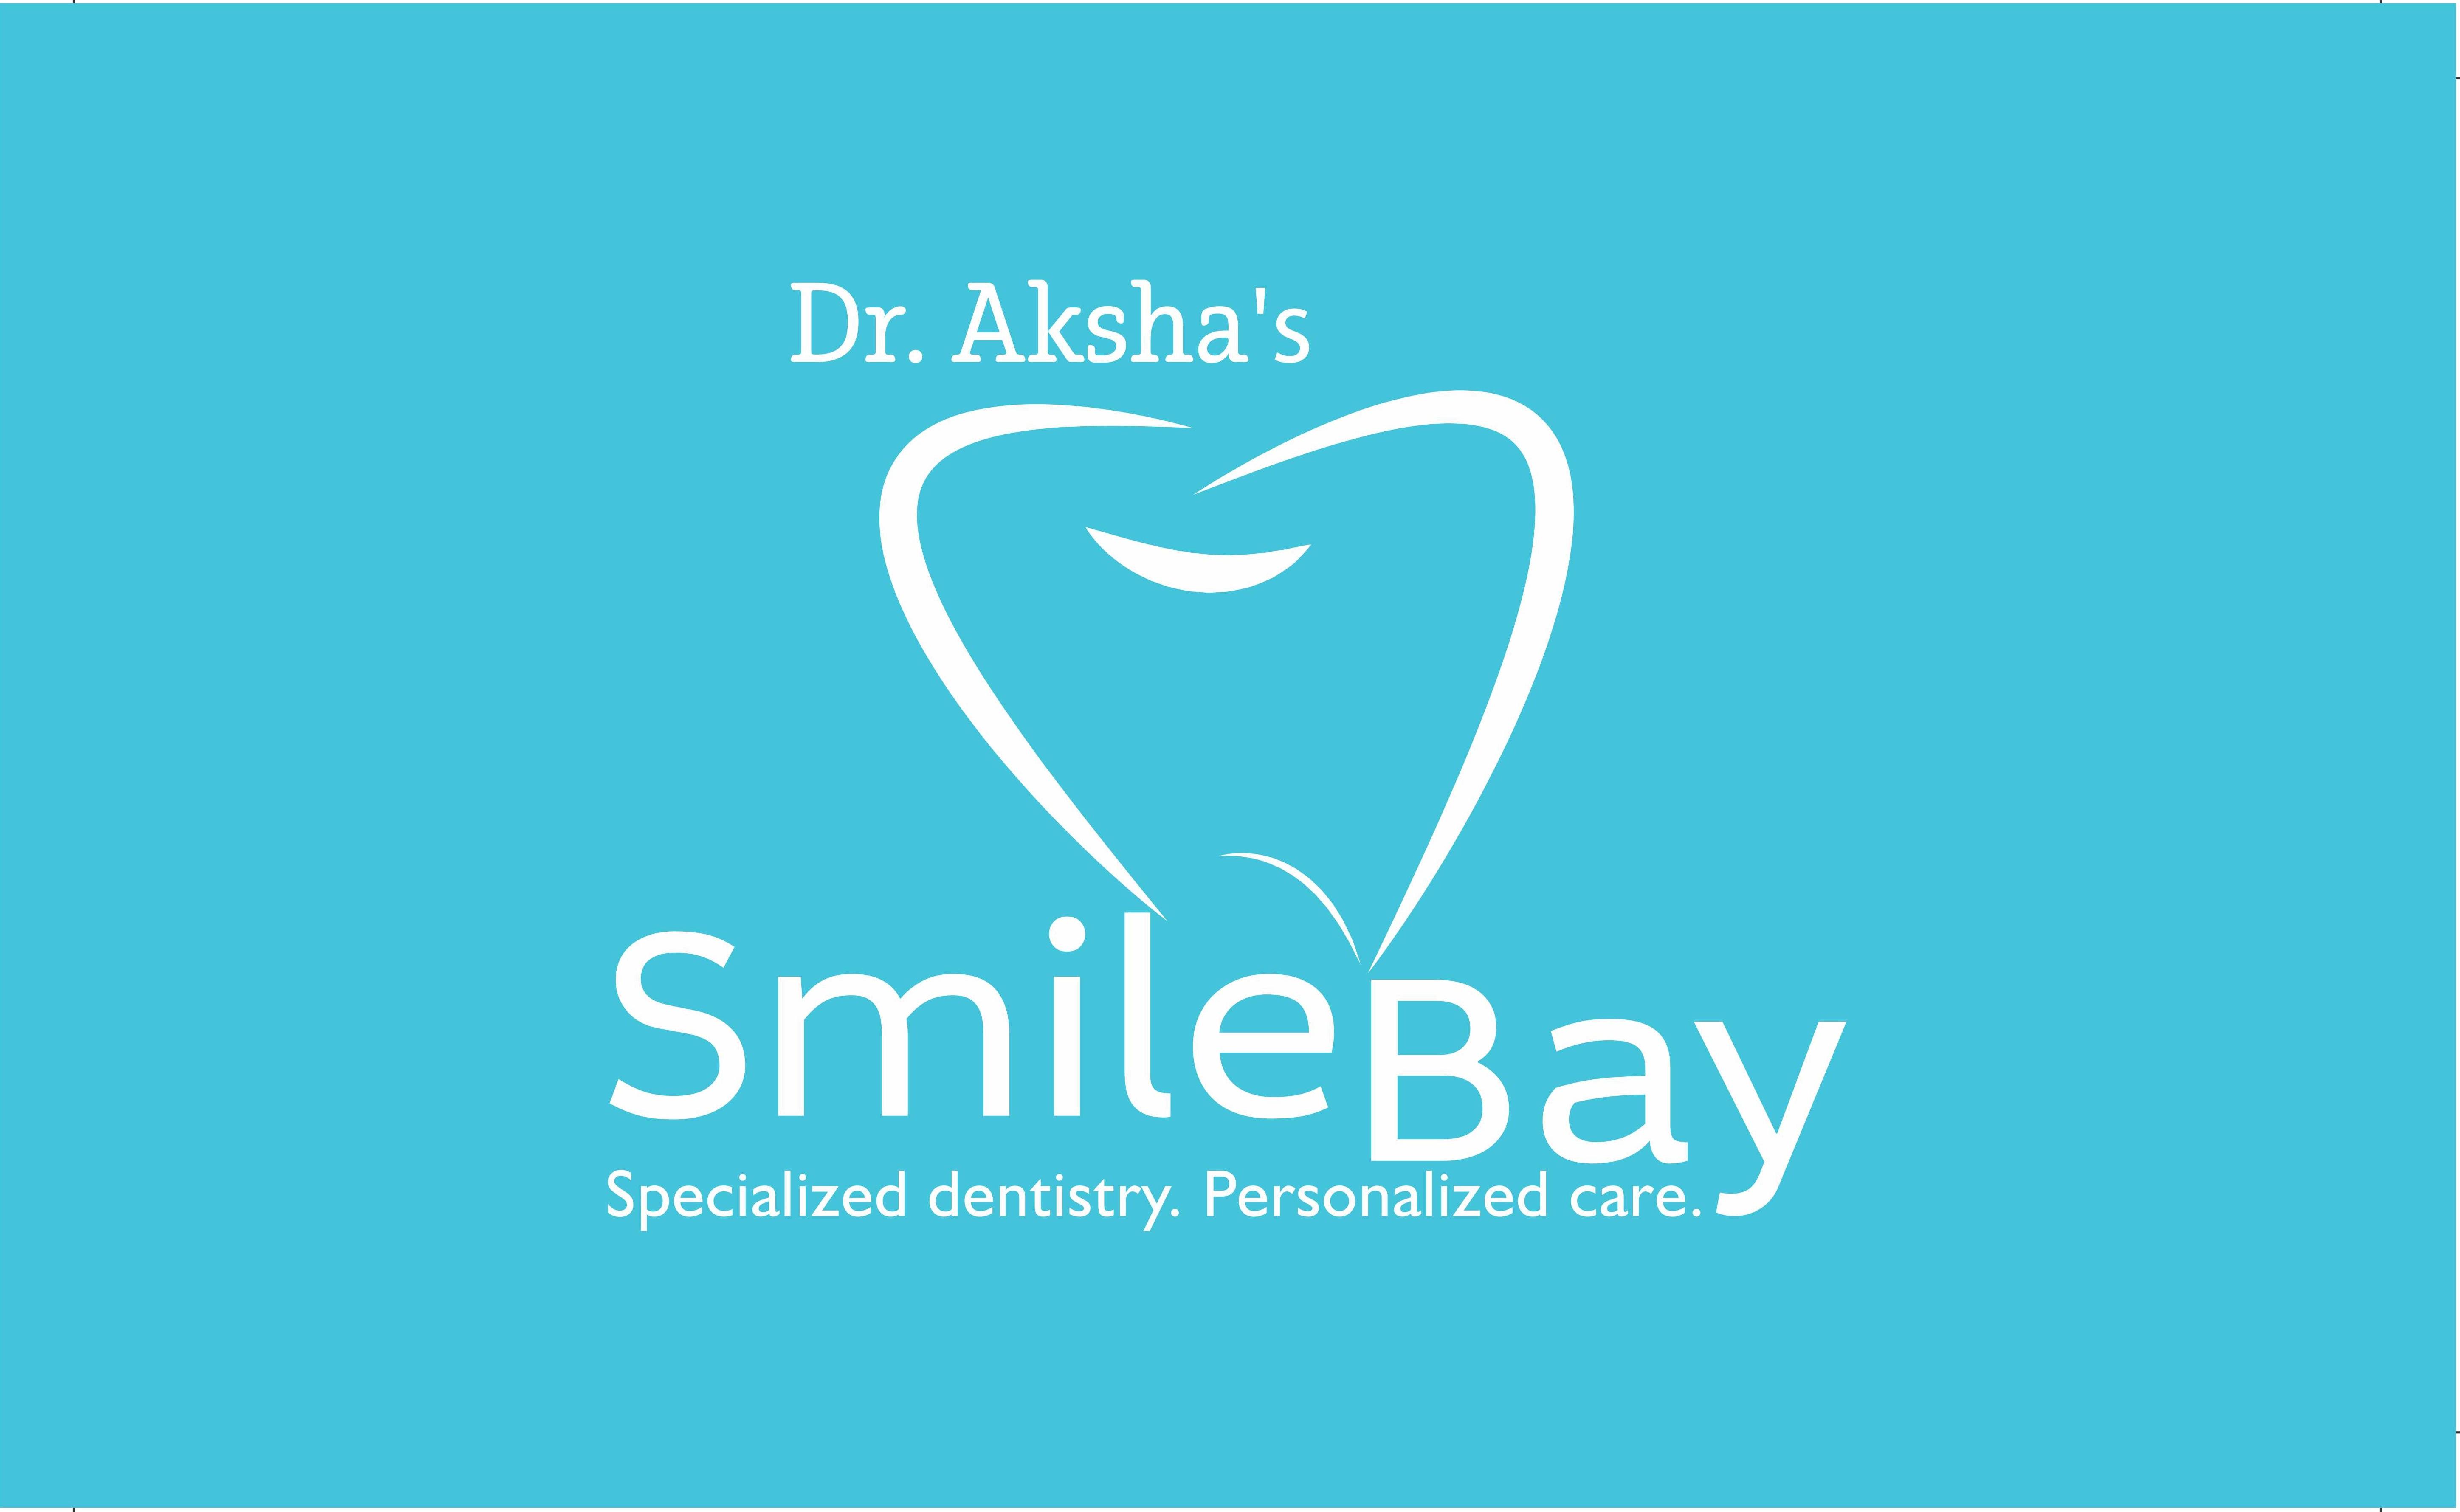 Dr Aksha's Smile Bay